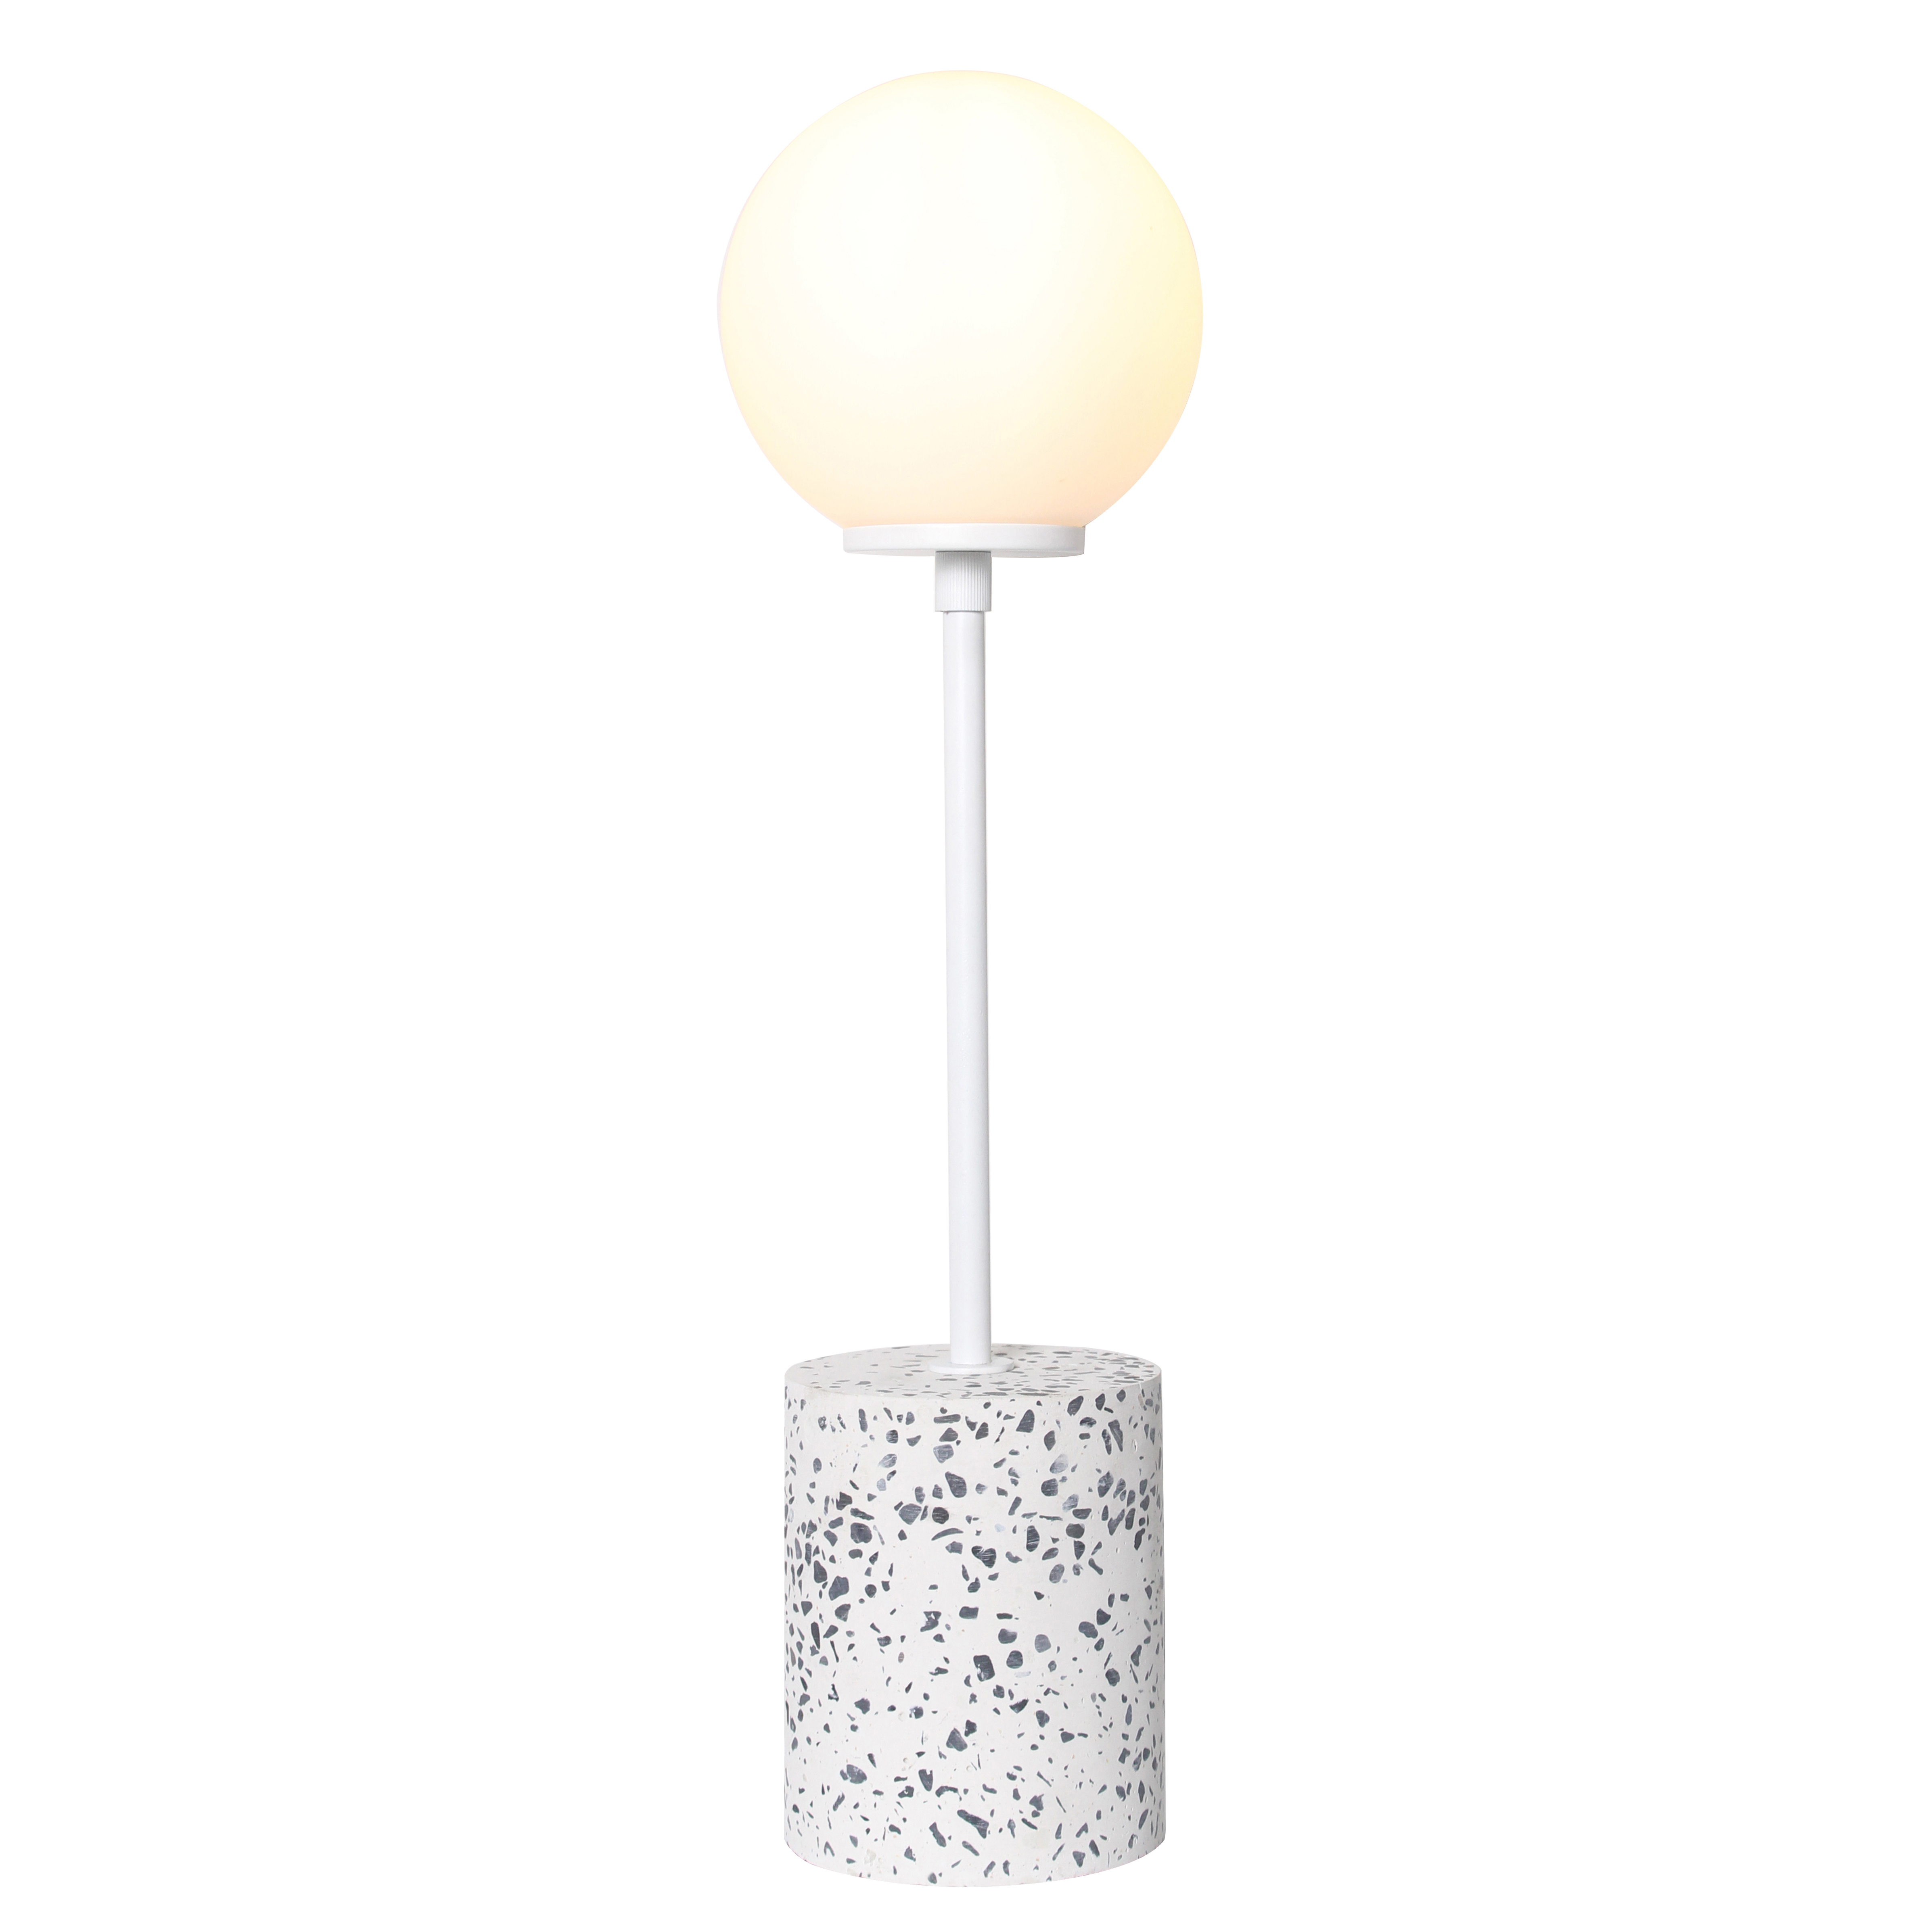 Pied de lampe en terrazzo blanc